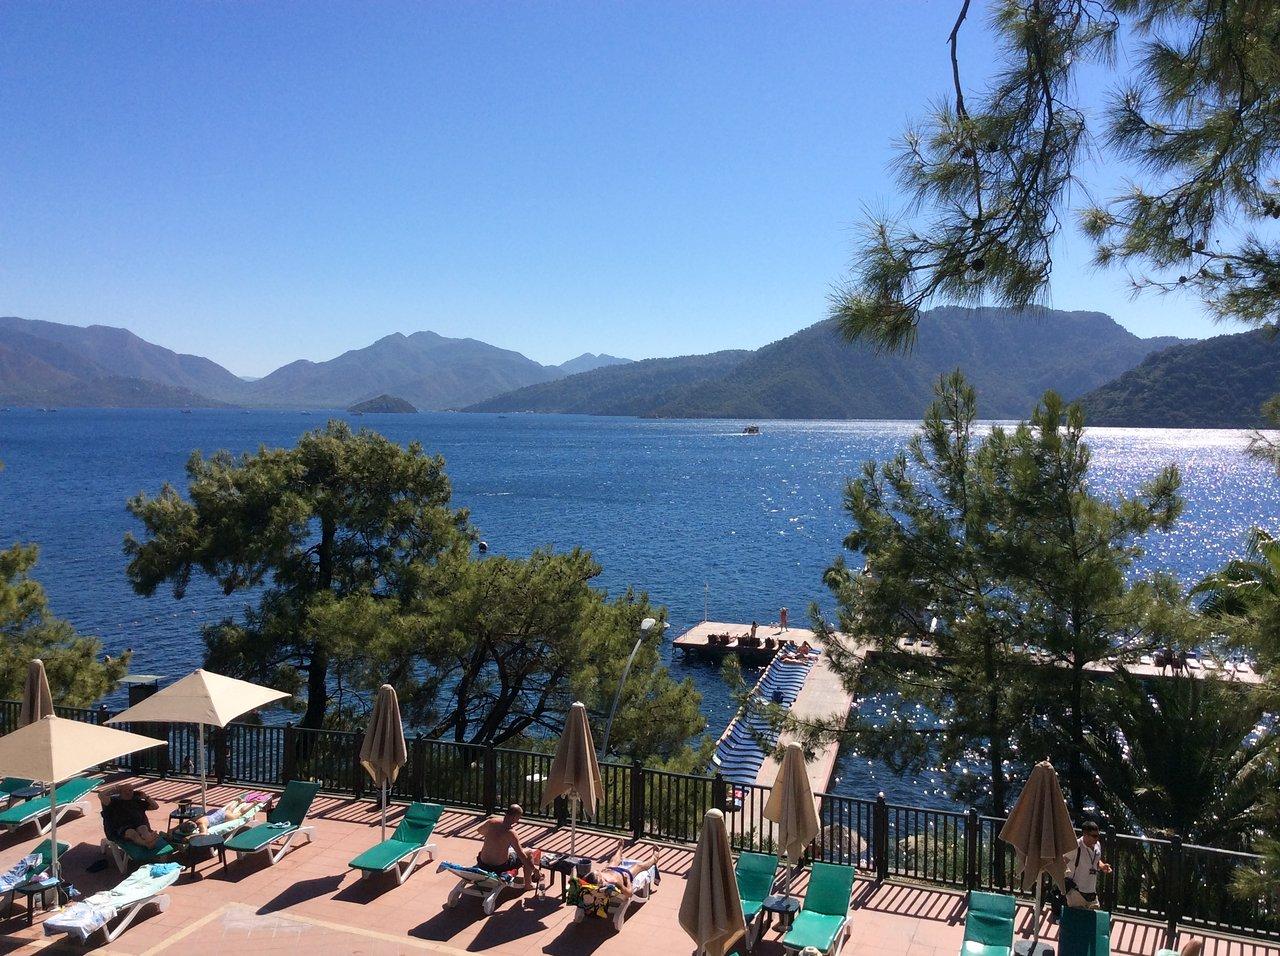 Hotel Marmaris Park (Turkey, Marmaris): photos and reviews of tourists 41